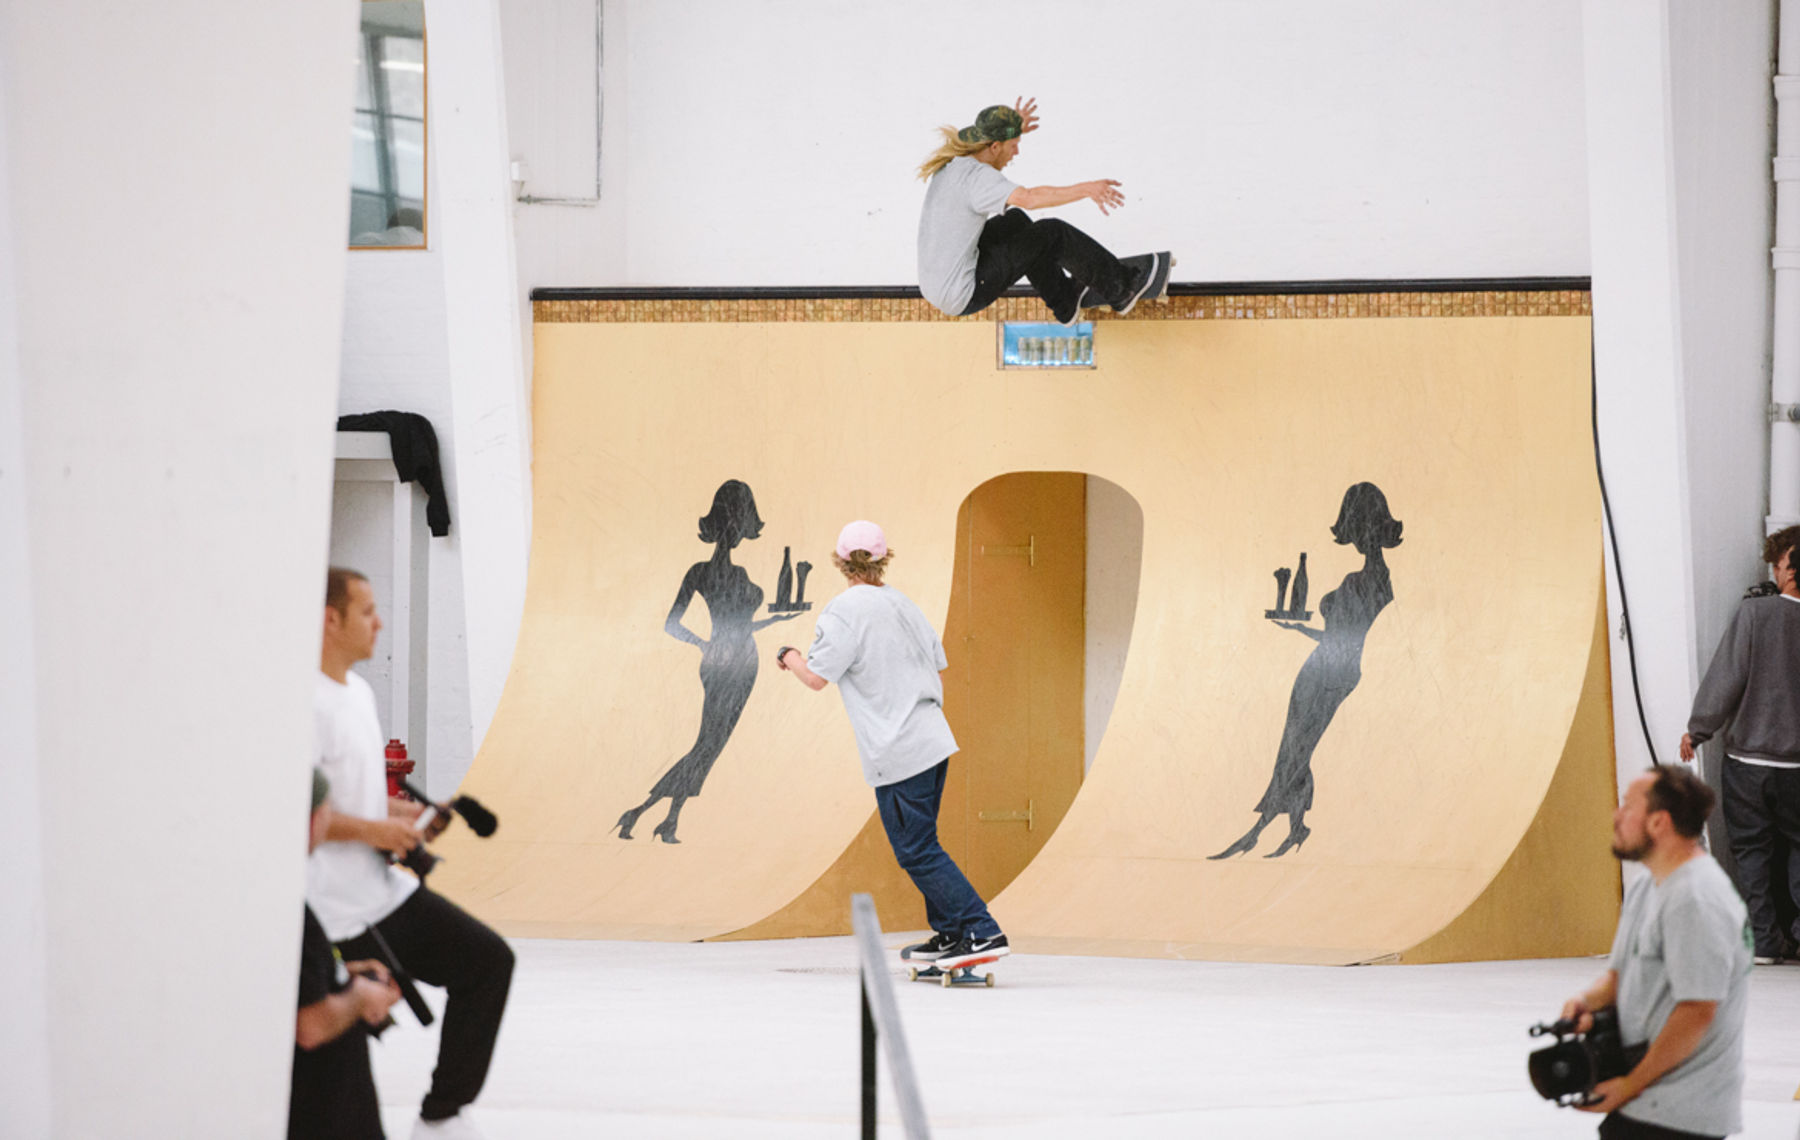 _IHC4638e-Tim-ZOm-Fs-5-0-Nike-SB-Copenhagen-Open-Day-3-July-2015-Photographer-Maksim-Kalanep